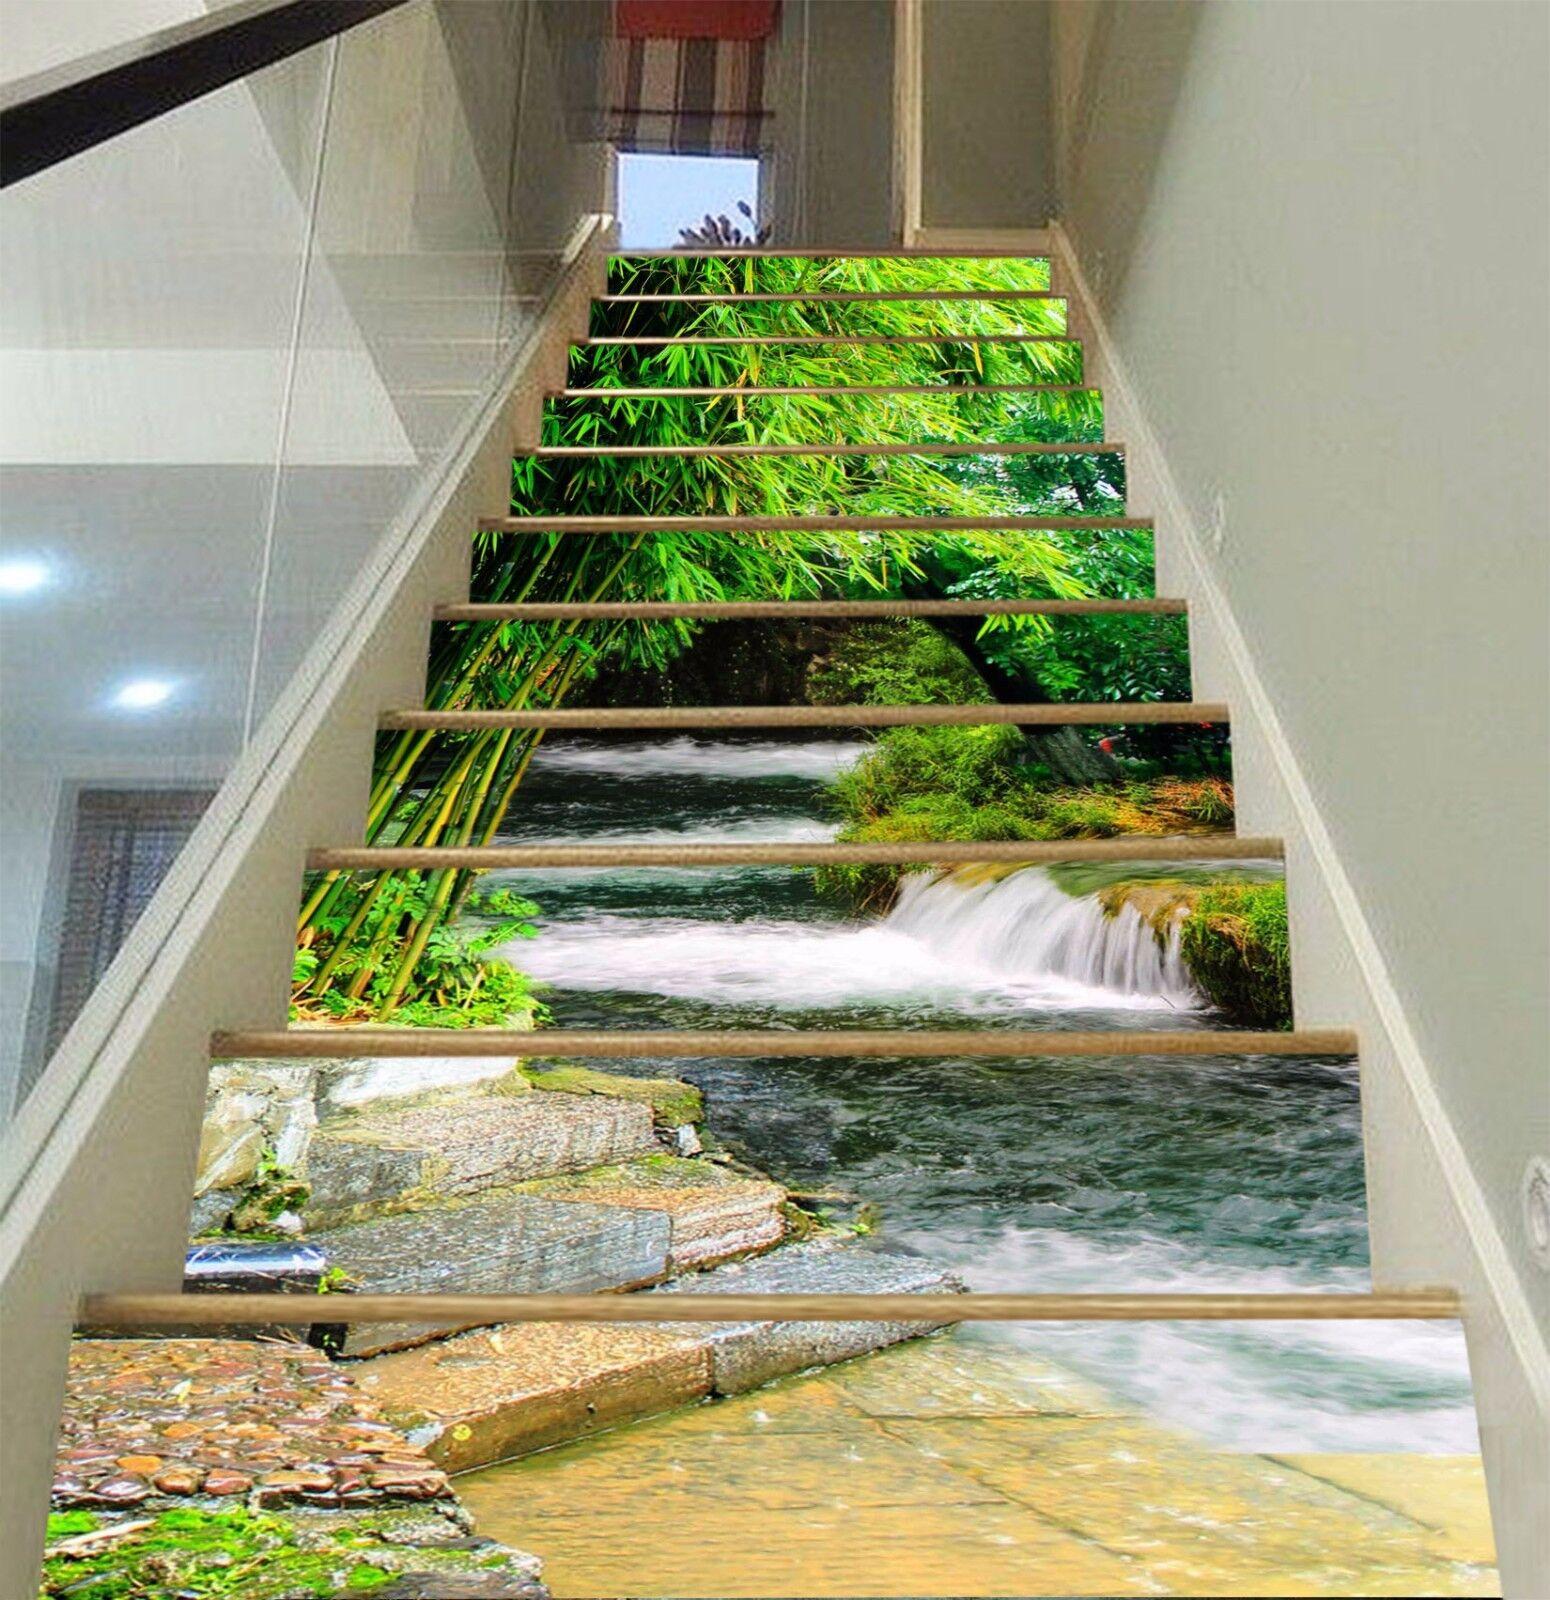 3D Green Bamboo 724 Stair Risers Decoration Photo Mural Vinyl Decal Wallpaper AU